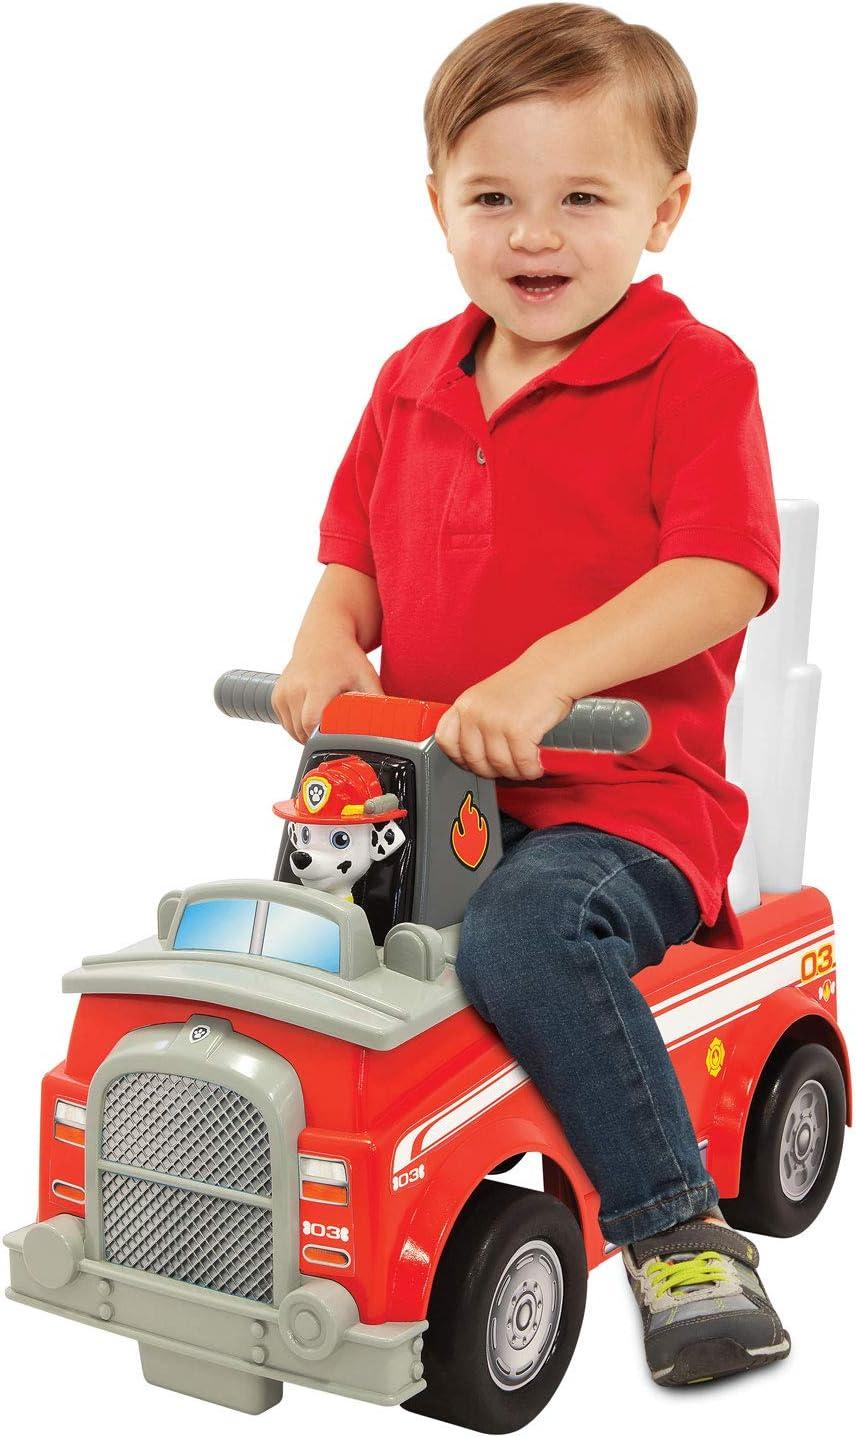 Paw Patrol Marshall Ride-On Fire Engine